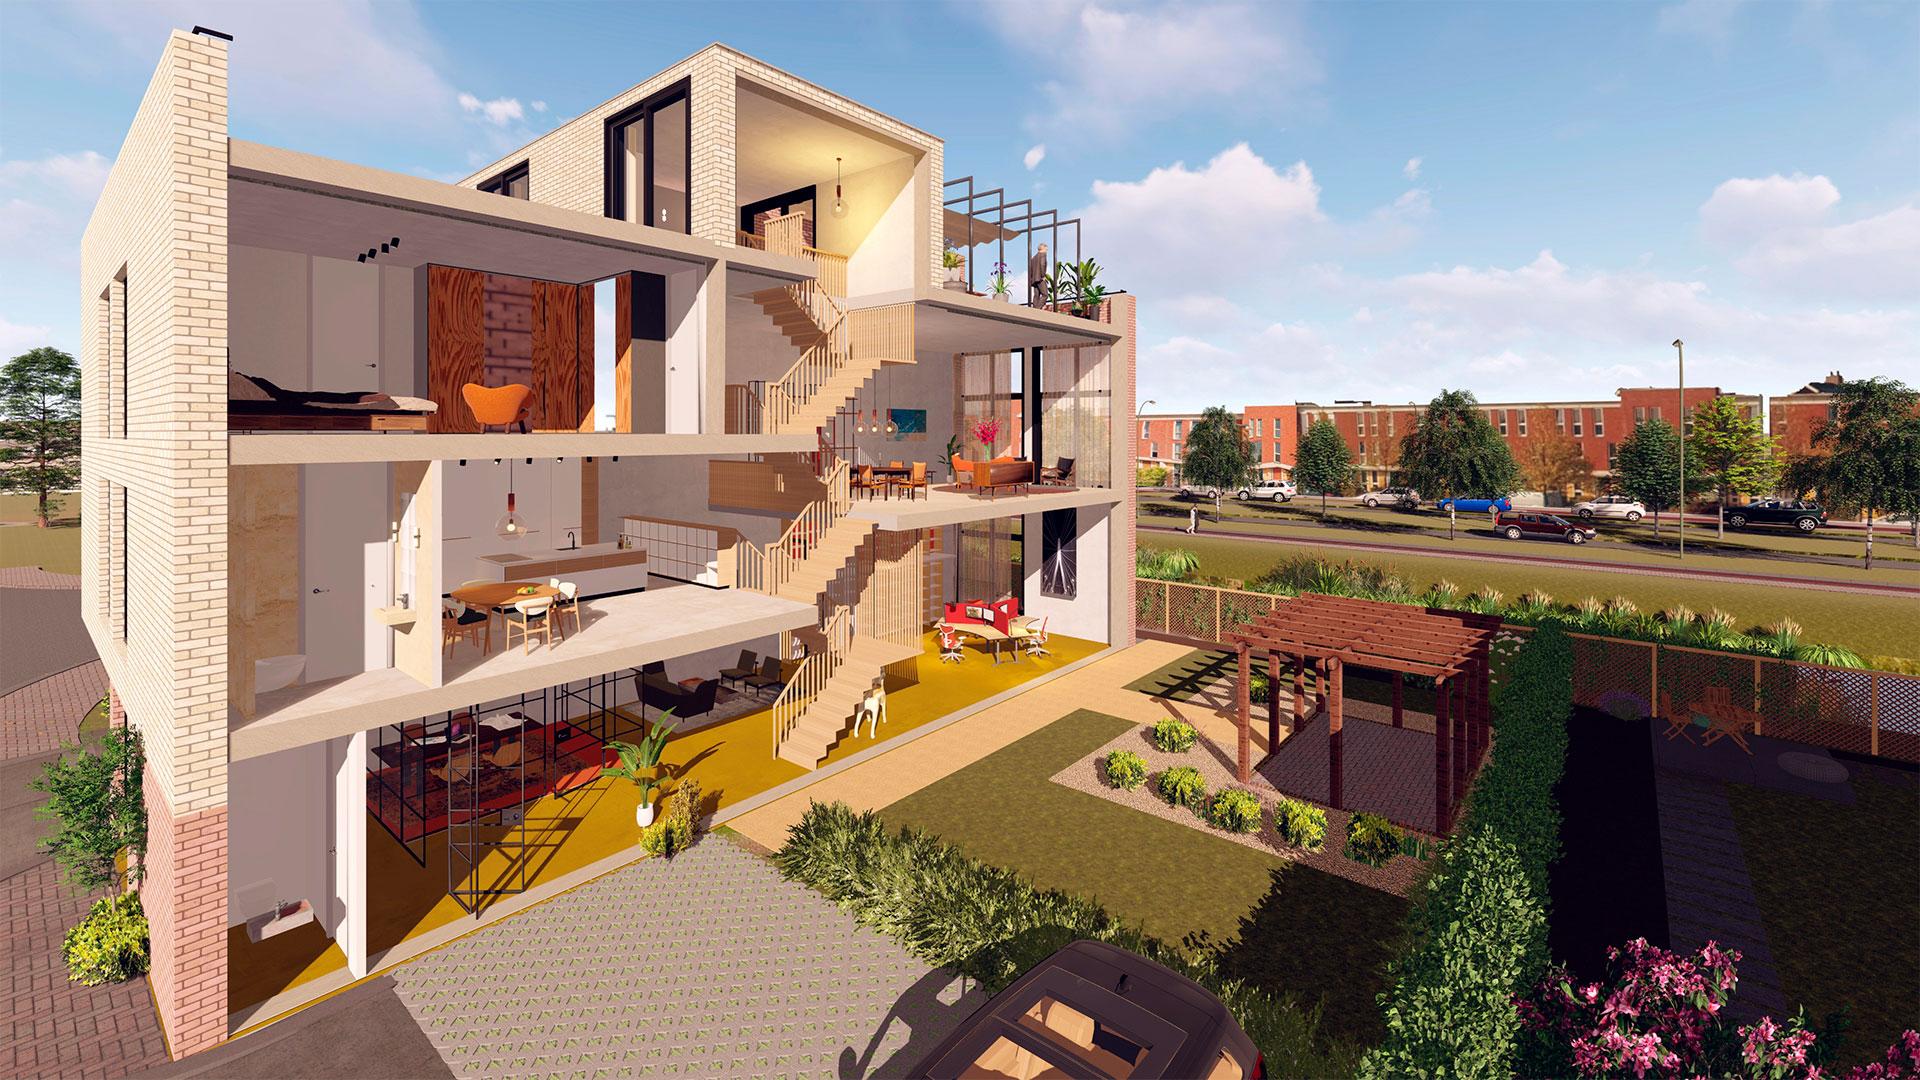 nexis-urban-villas-doorsnede.jpg